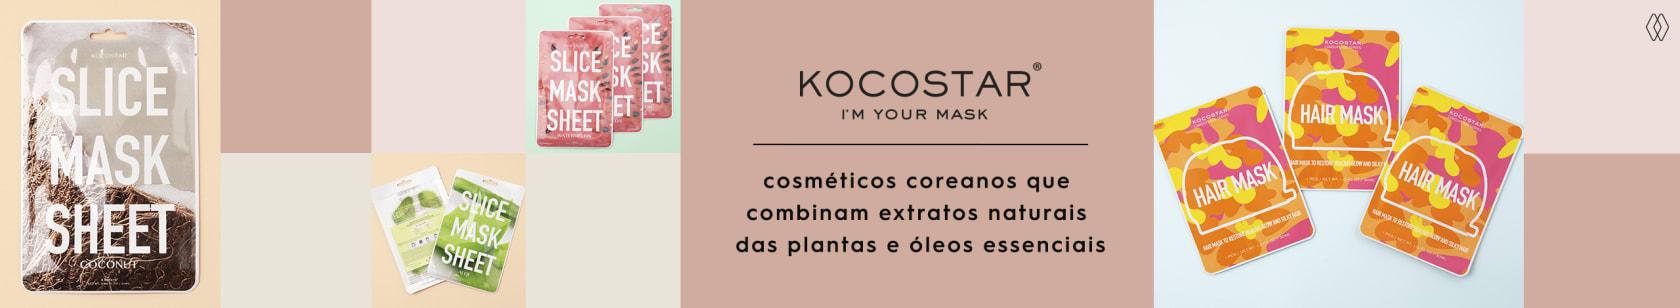 KOCOSTAR | AMARO